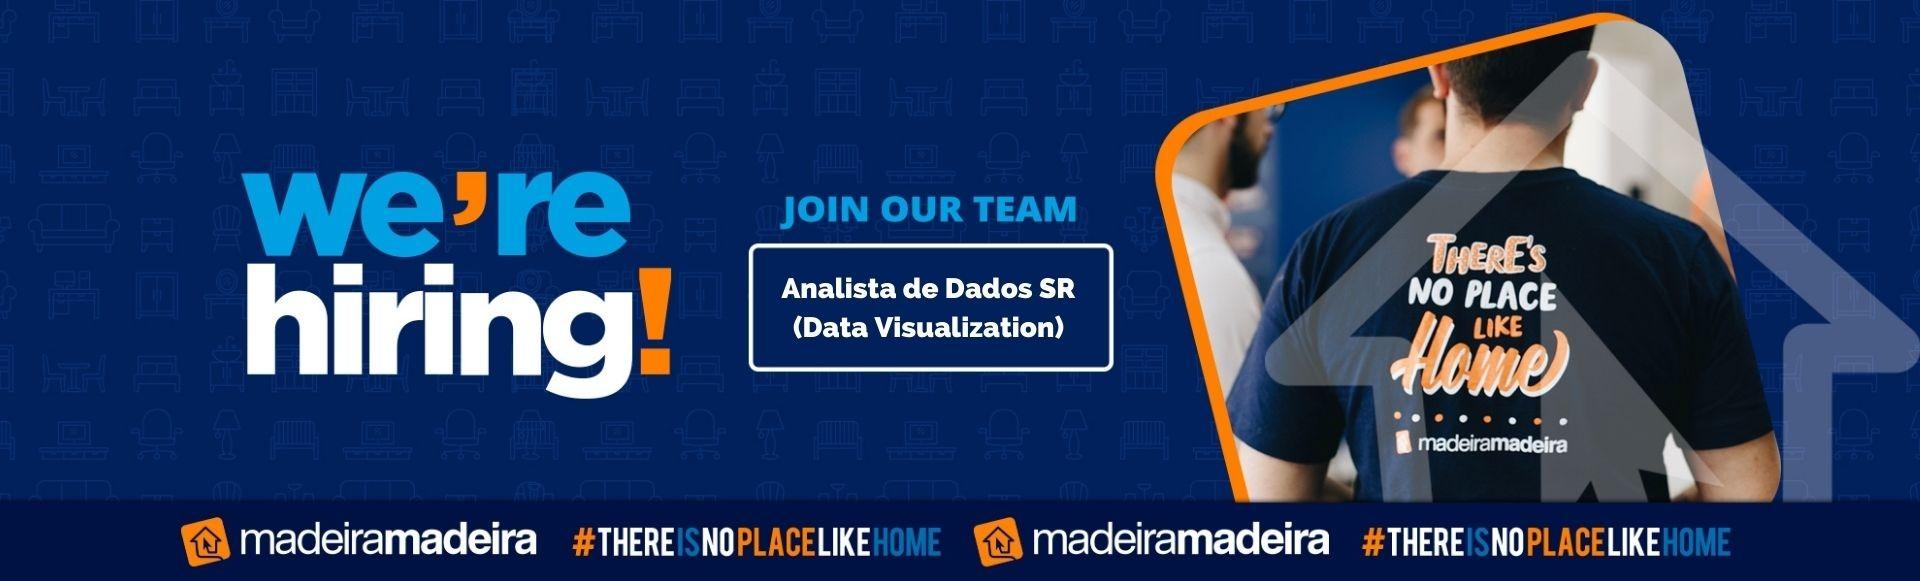 Analista de Dados SR (Data Visualization)